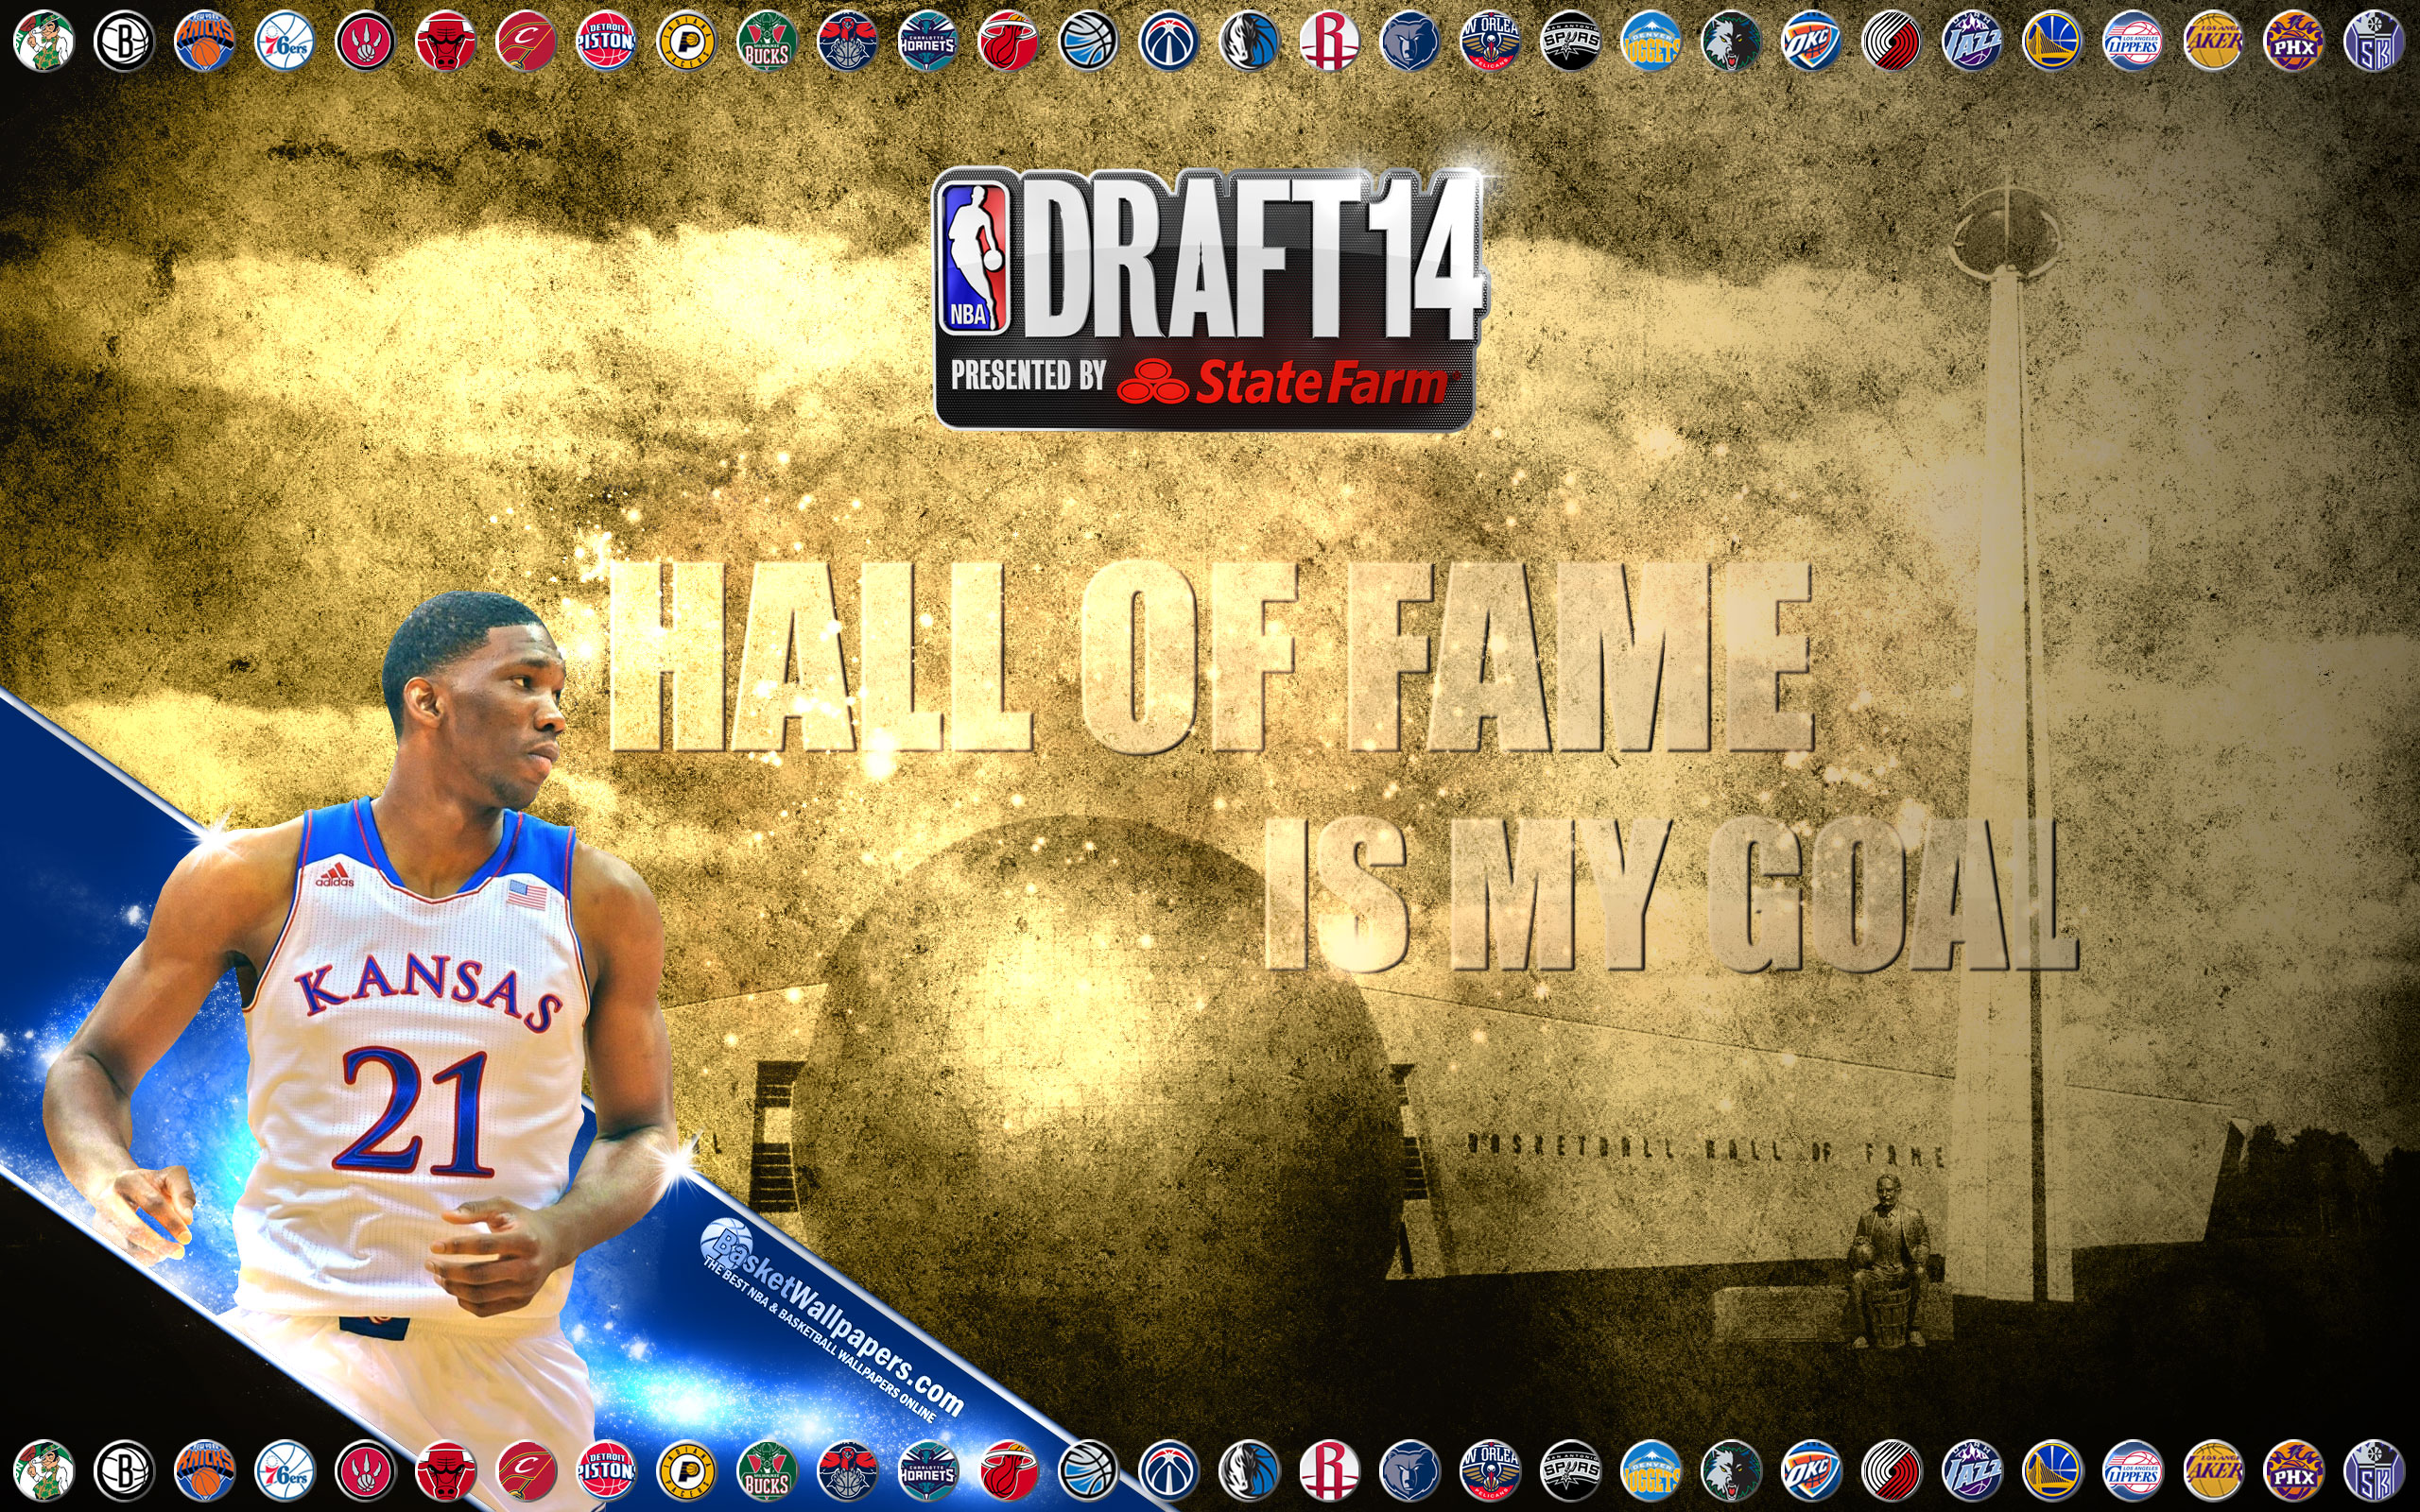 Joel Embiid 2014 Nba Draft Wallpaper Basketball Wallpapers